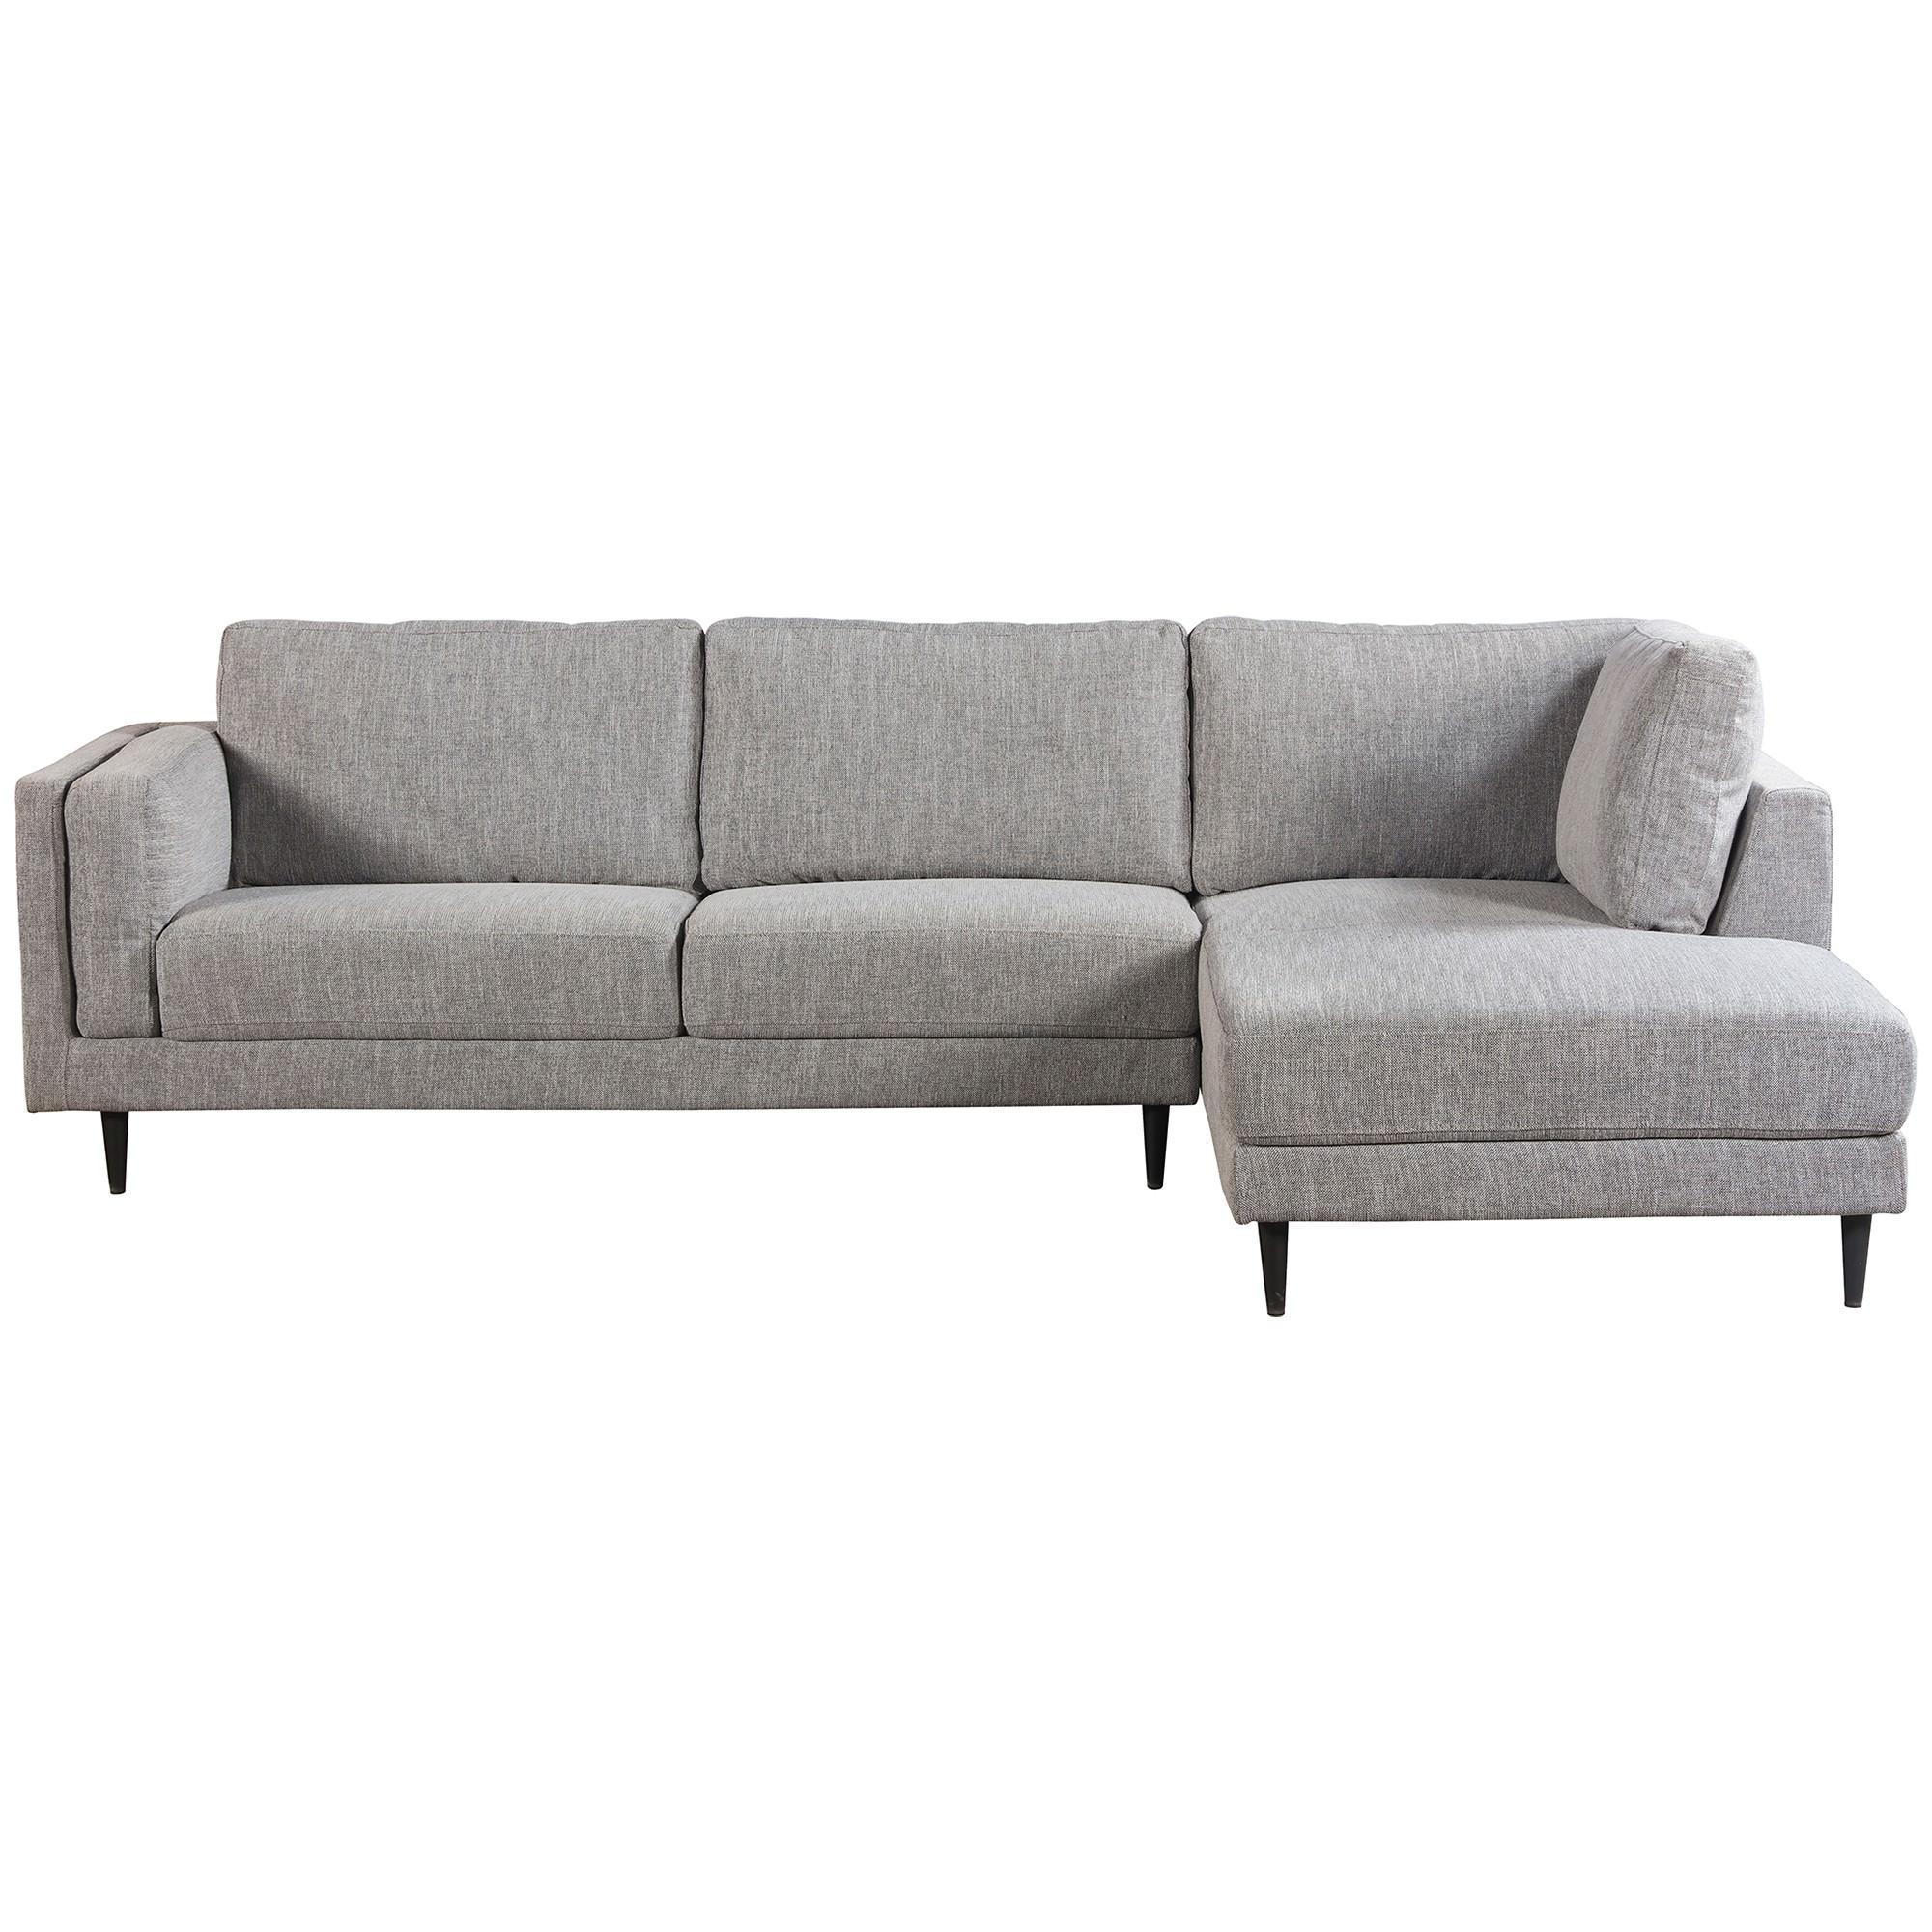 Almsele Fabric Corner Sofa, 2 Seater with RHF Chaise